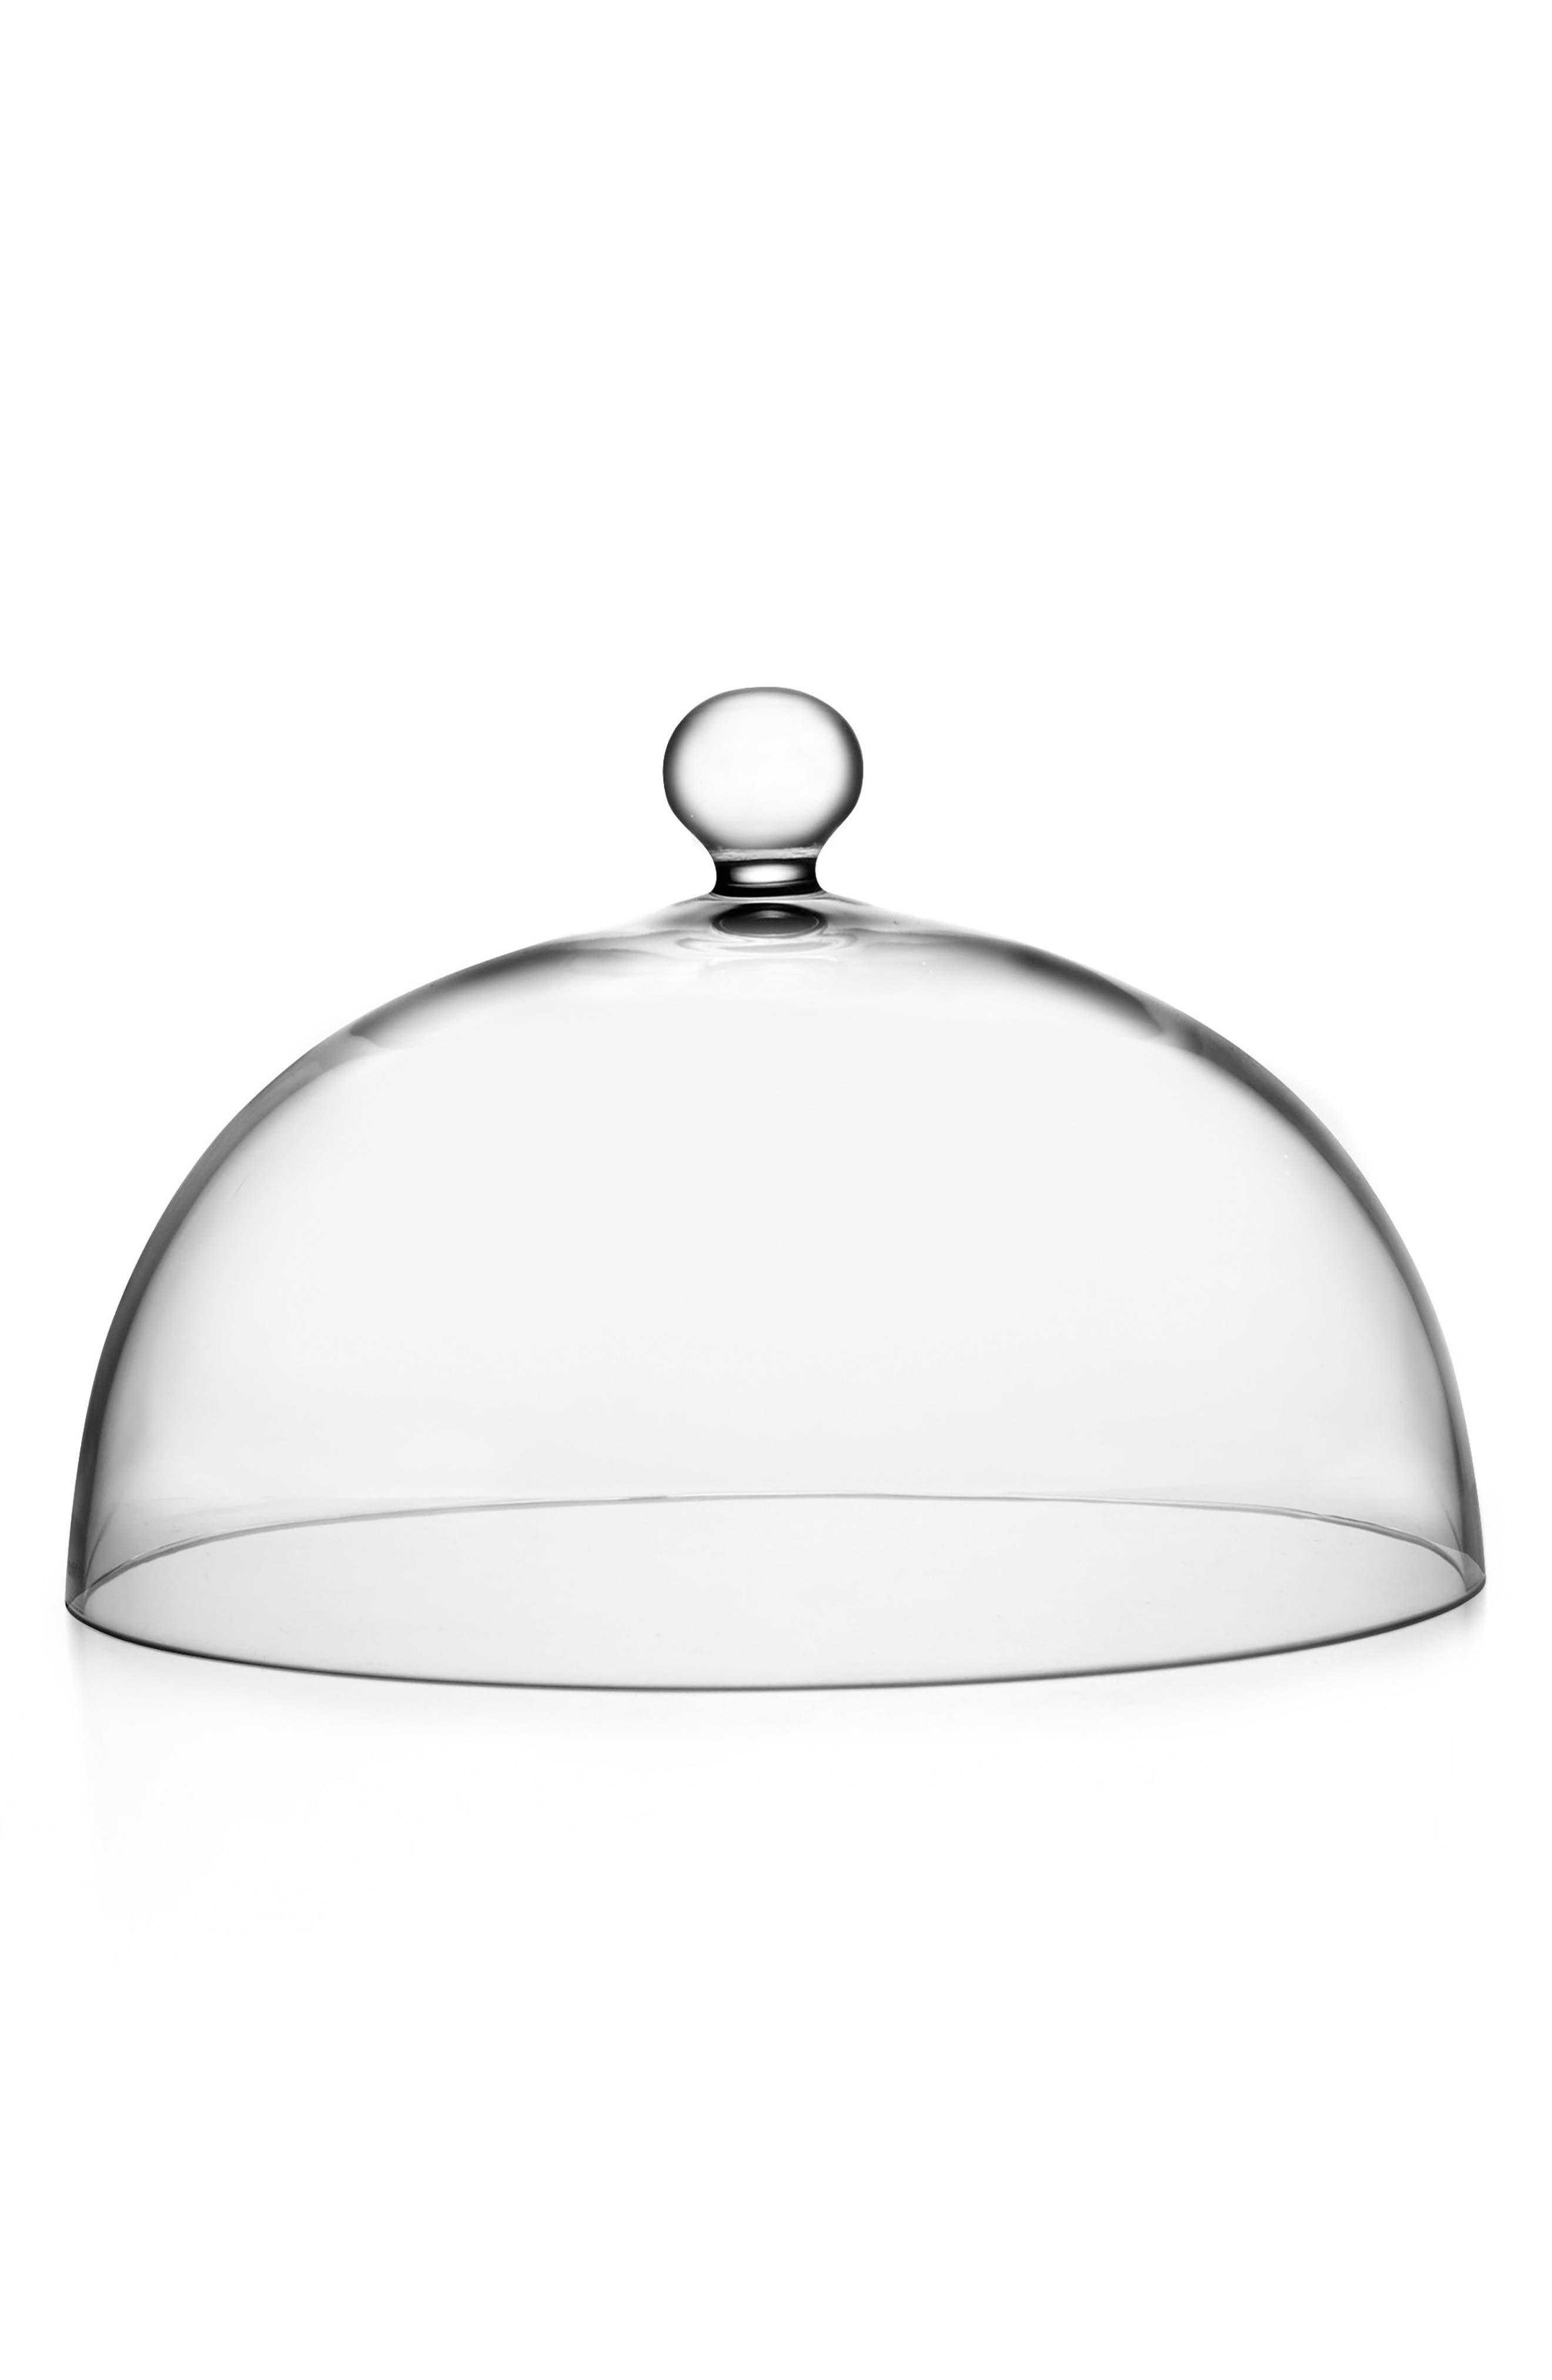 Nambé Moderne Large Cake Dome & Plate